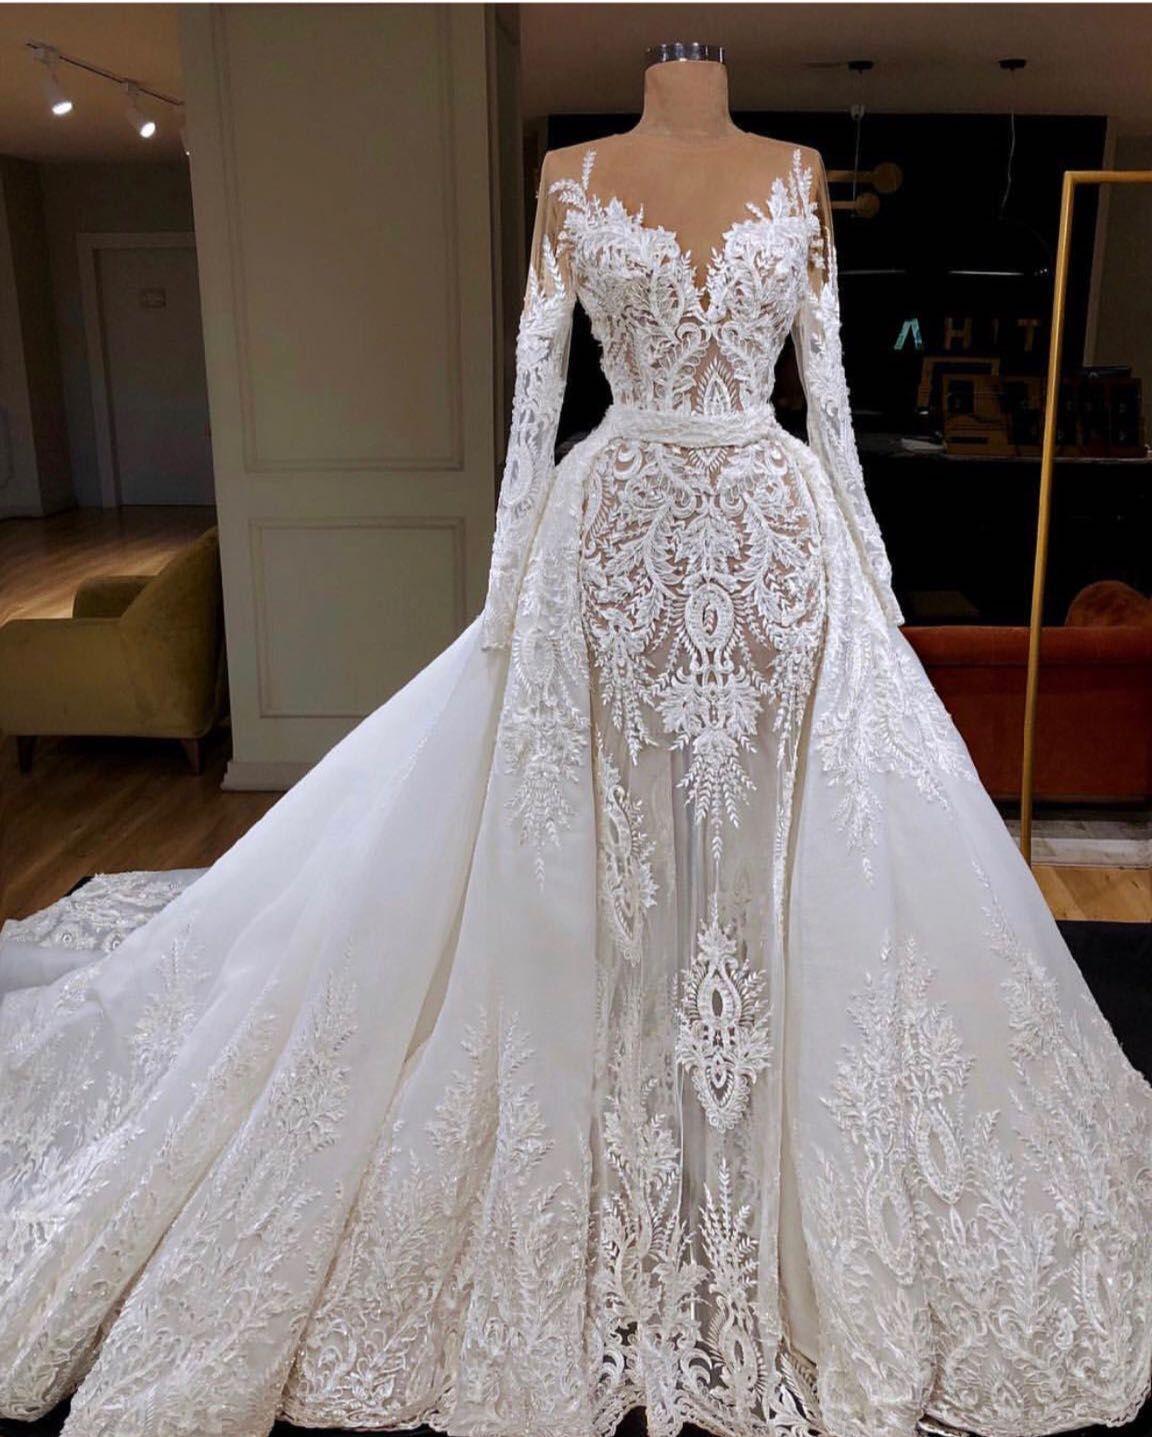 Organza Weeding Dress 2019 Mermaid Wedding Dress 2019 Weeding Dress 2019 Lace Wedding Dress 2019 Wedding Dresses Bridal Dresses Dream Wedding Dresses